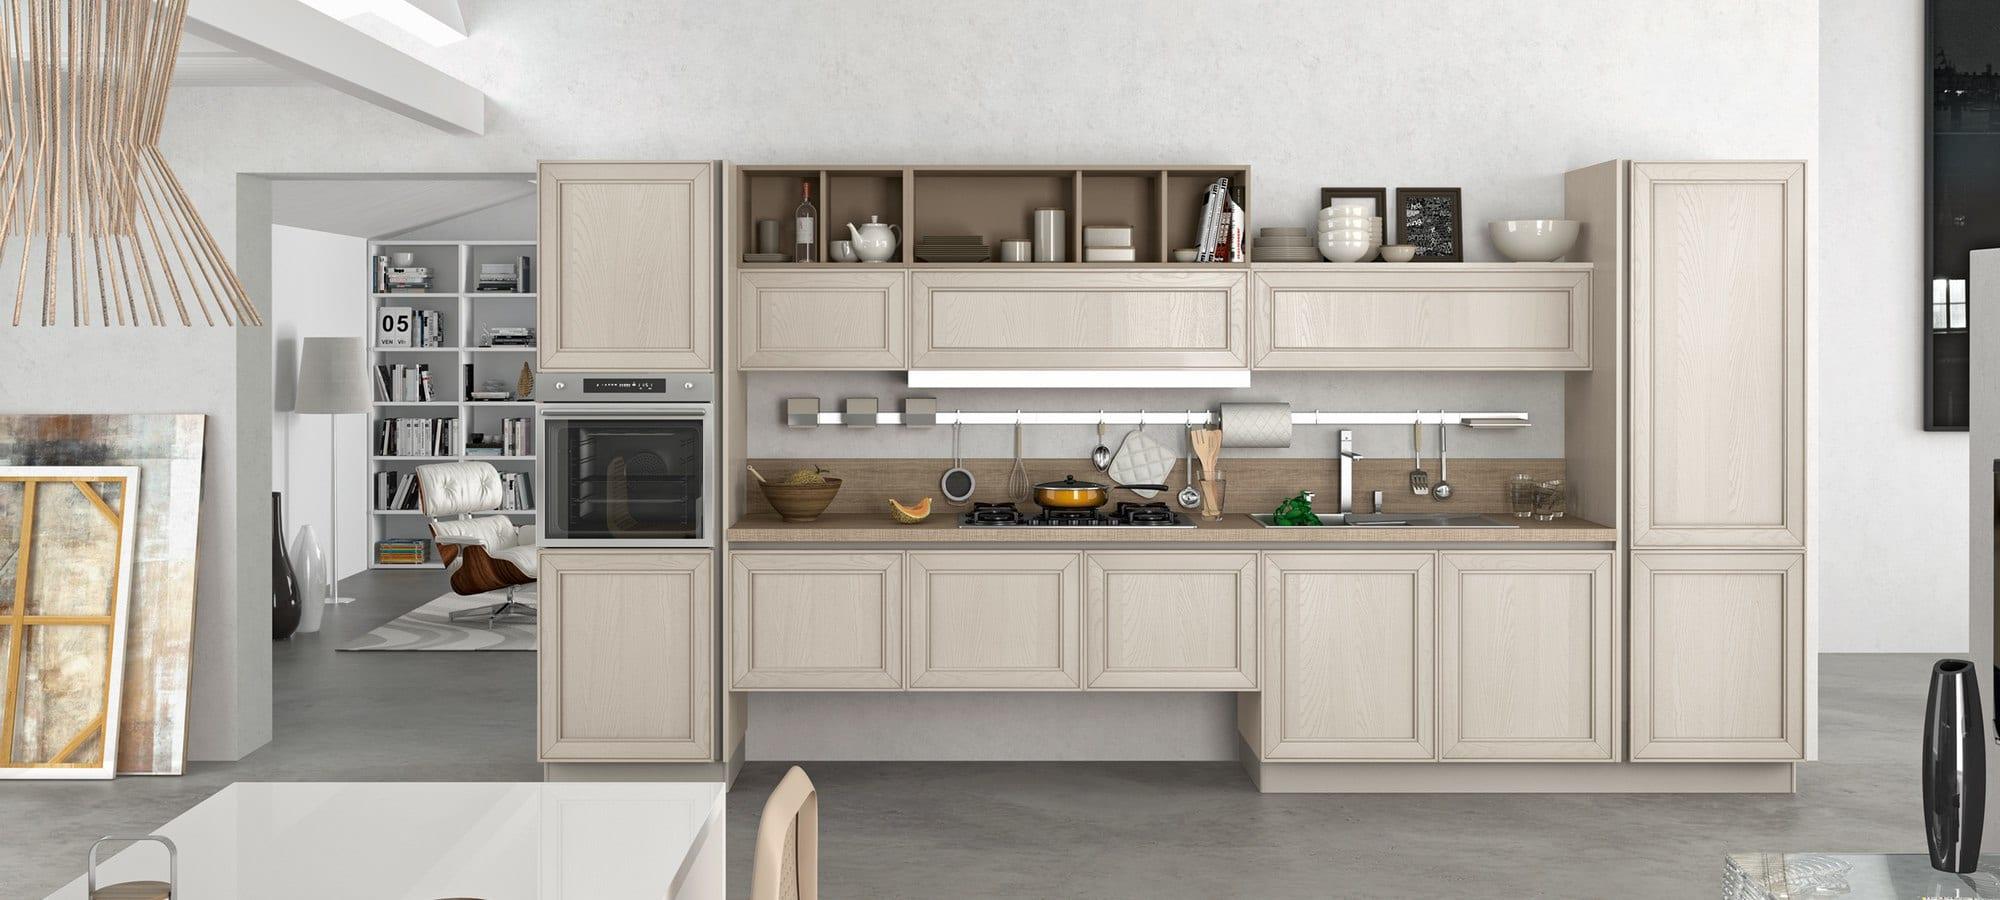 Cucina stosa raimondi idee casa for Cucine bologna